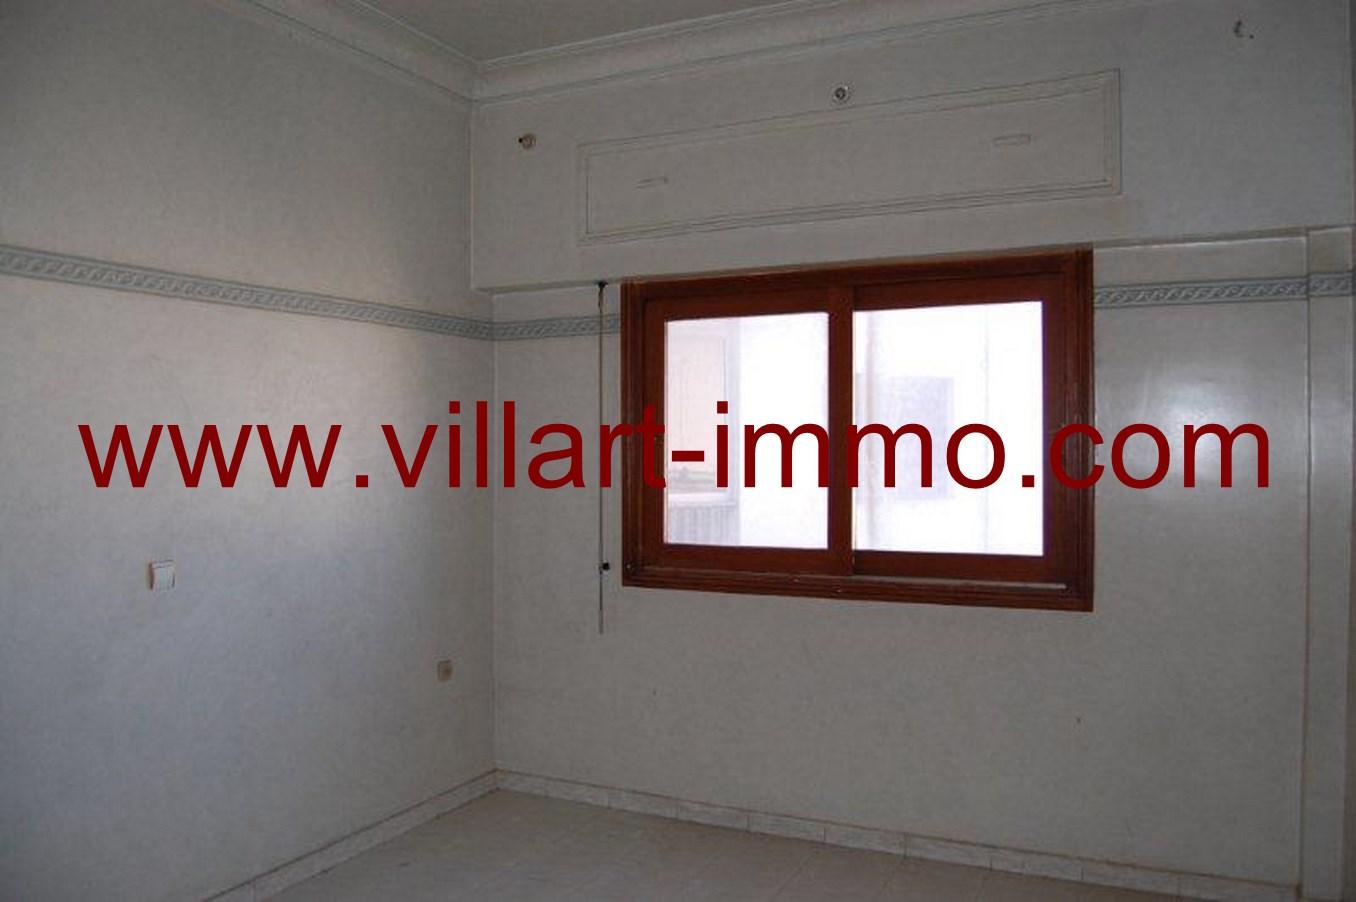 5-Location-Appartement-Non meublé-Tanger-Chambre 2-L662-Villart immo